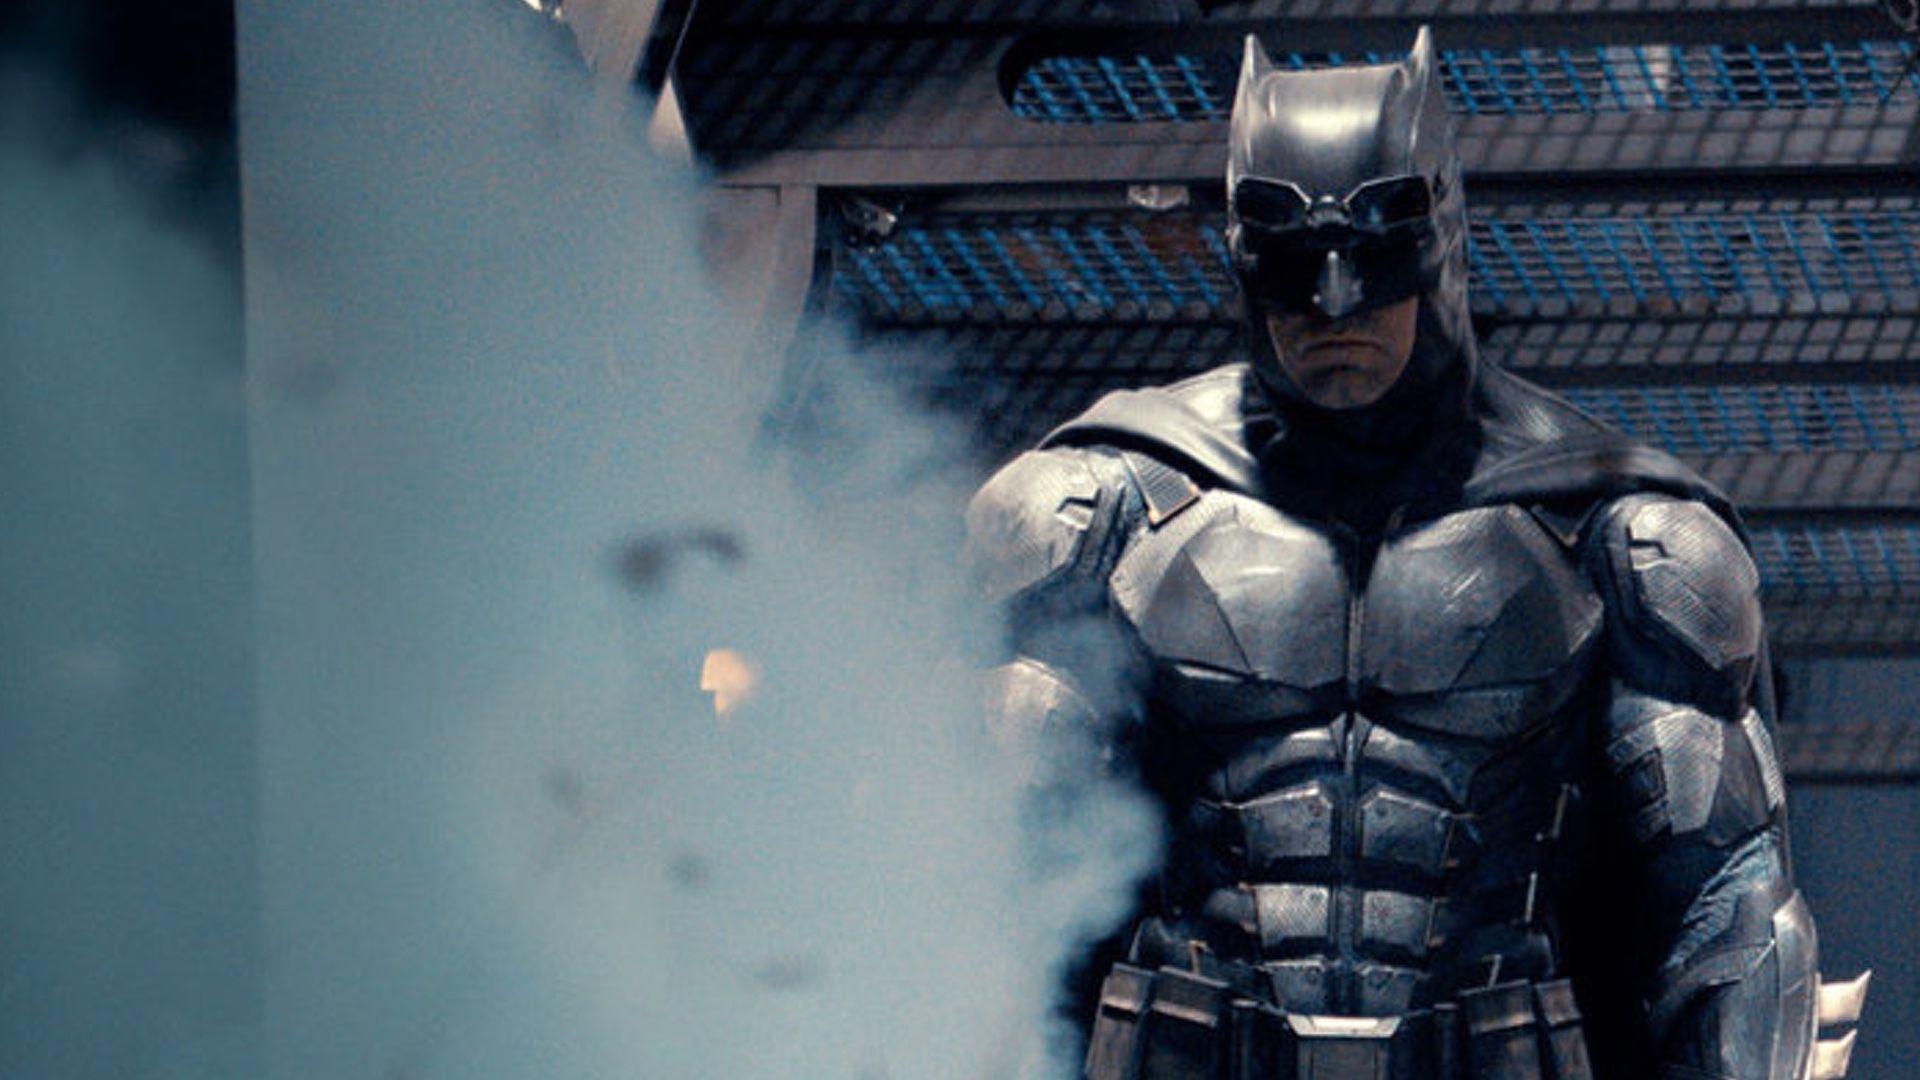 Ben Affleck Batman Costume Wallpapers Top Free Ben Affleck